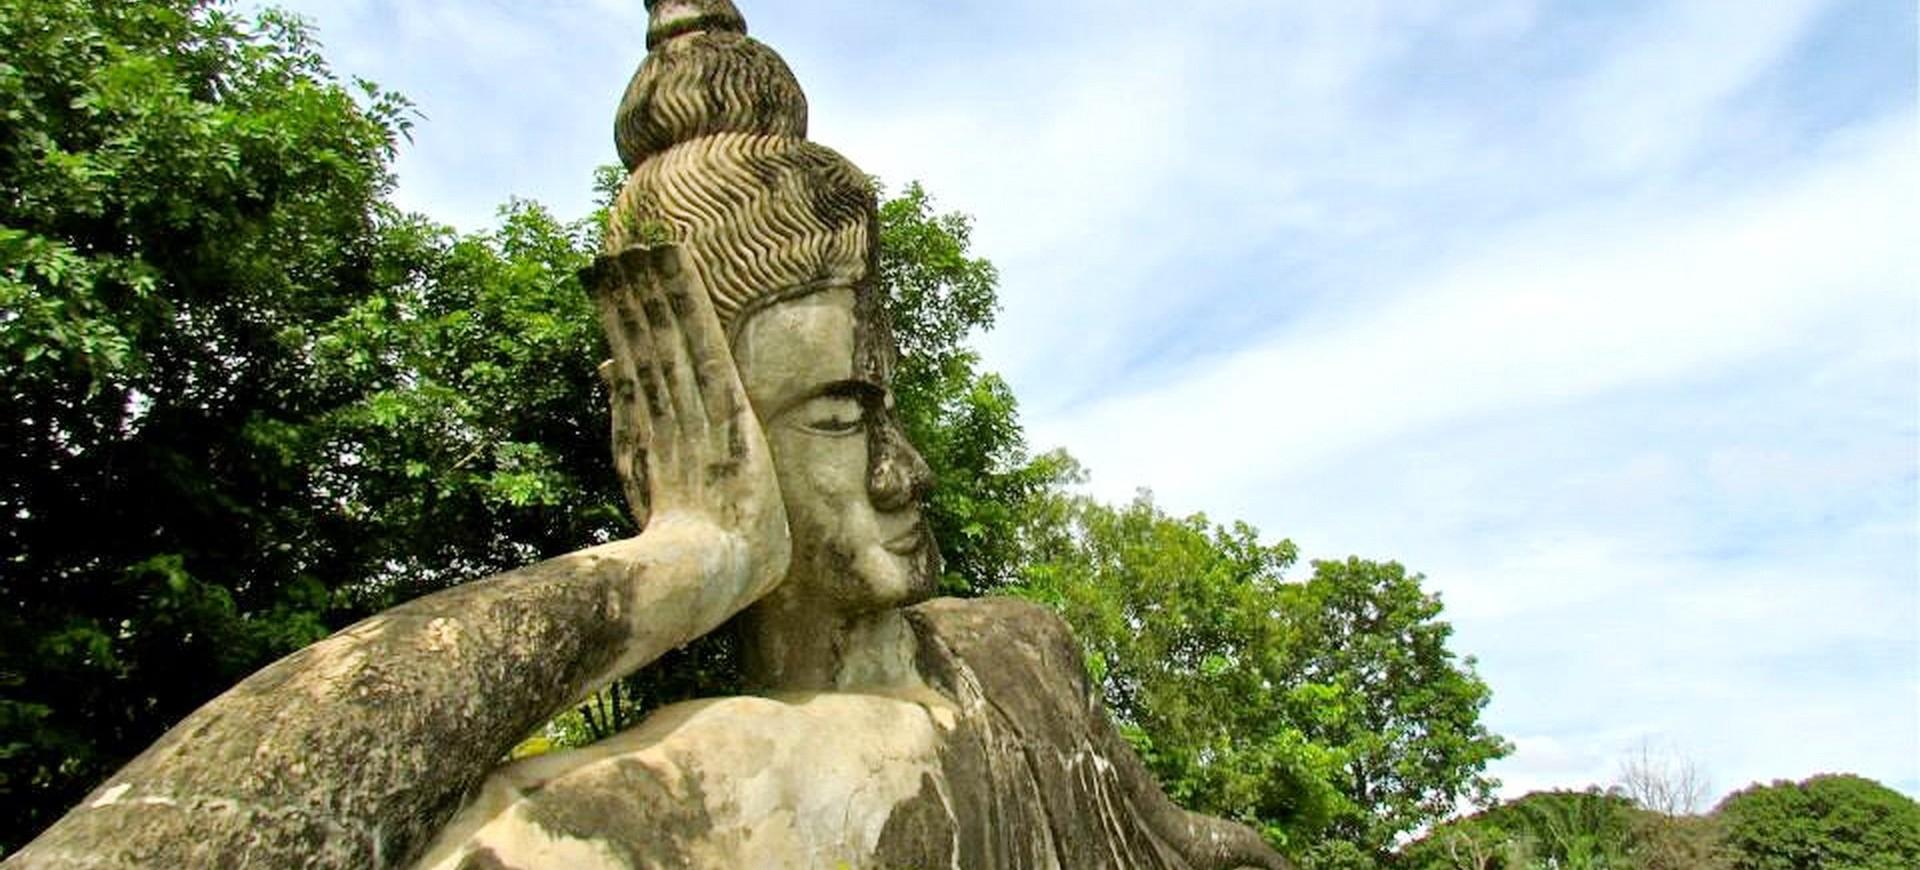 Laos Vientiane Wat Xiengkhuan 001